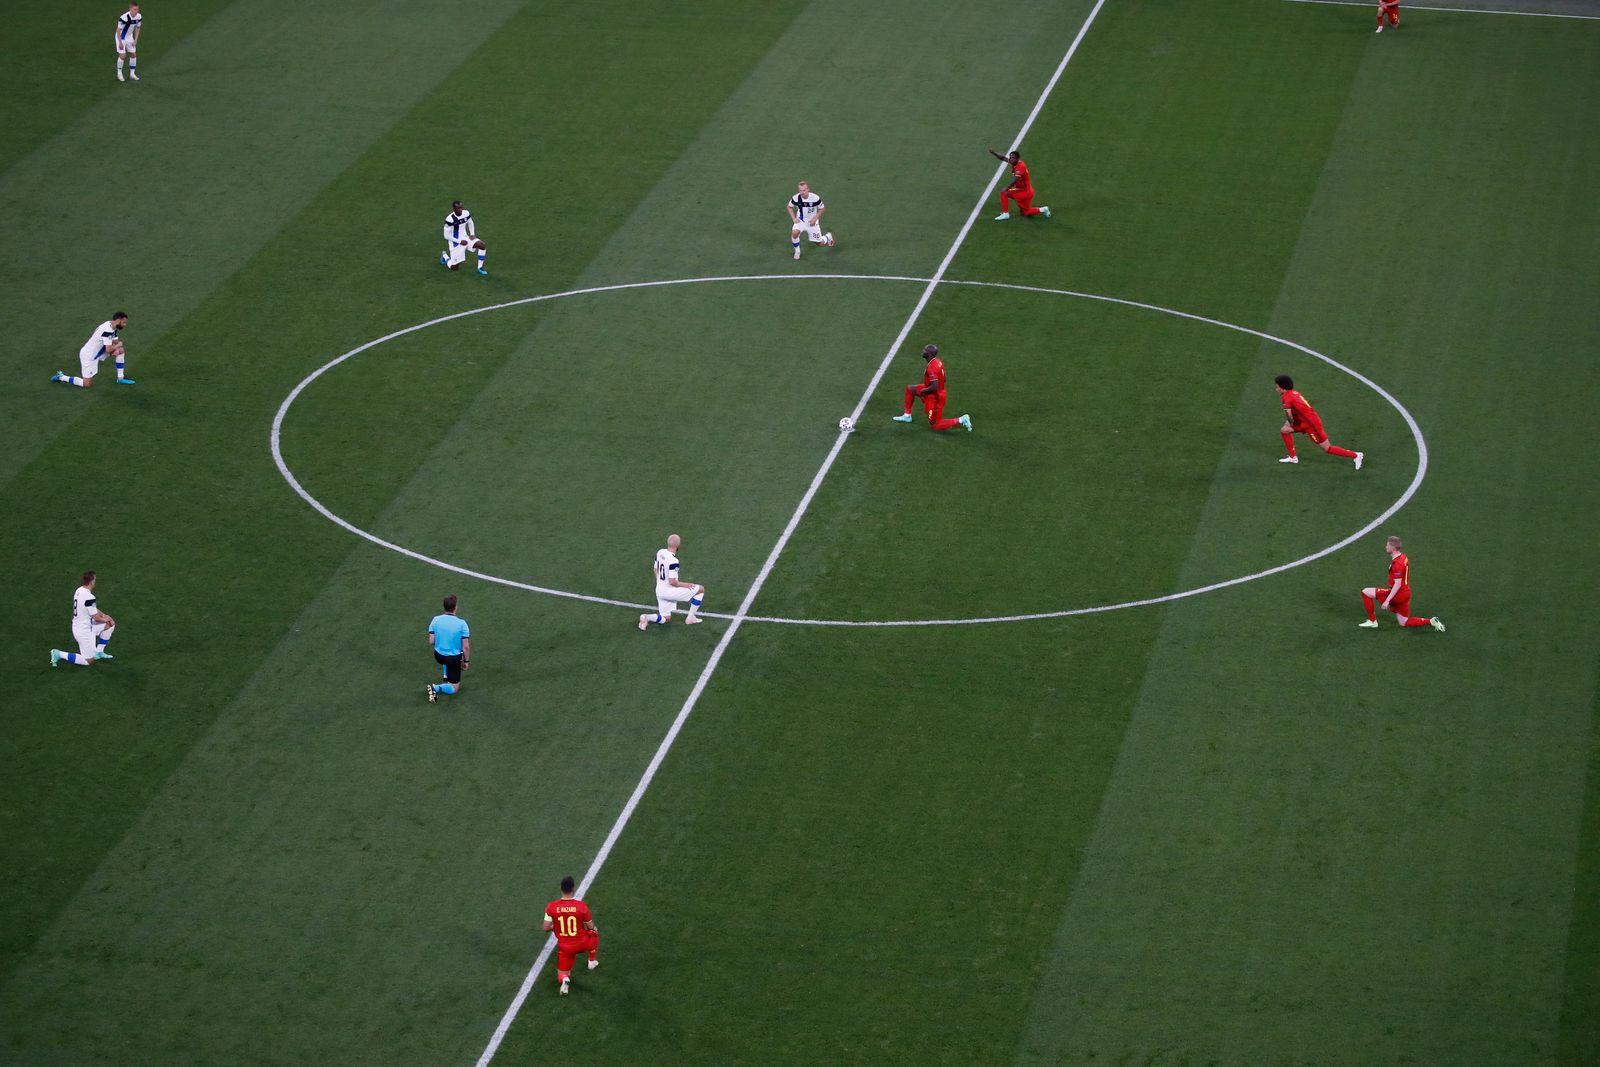 Russia Finland Belgium Euro 2020 Soccer